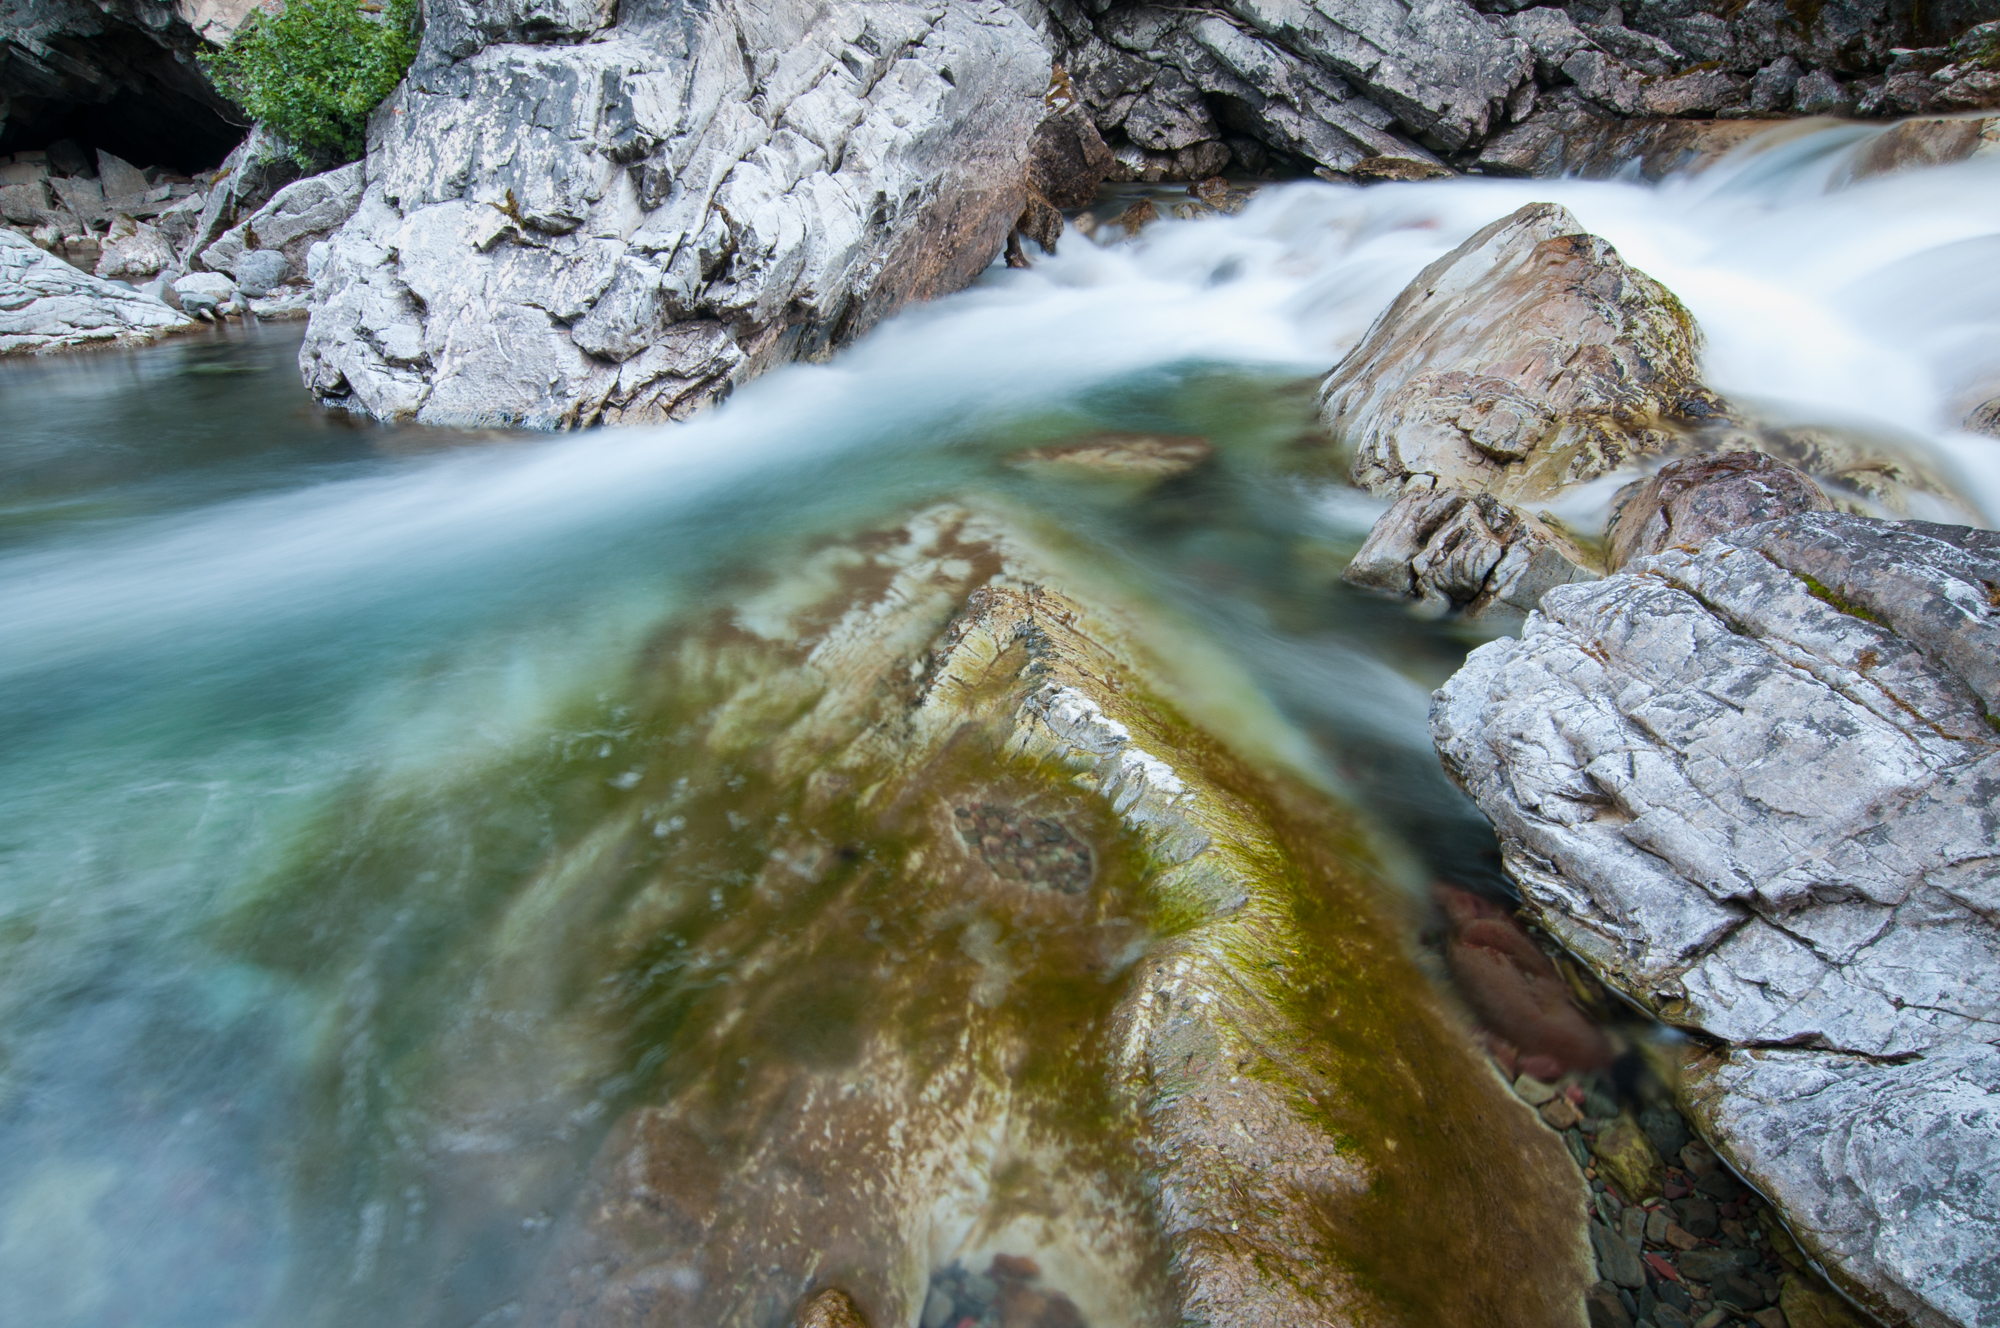 Cameron Creek, Waterton Lakes National Park, July 2015